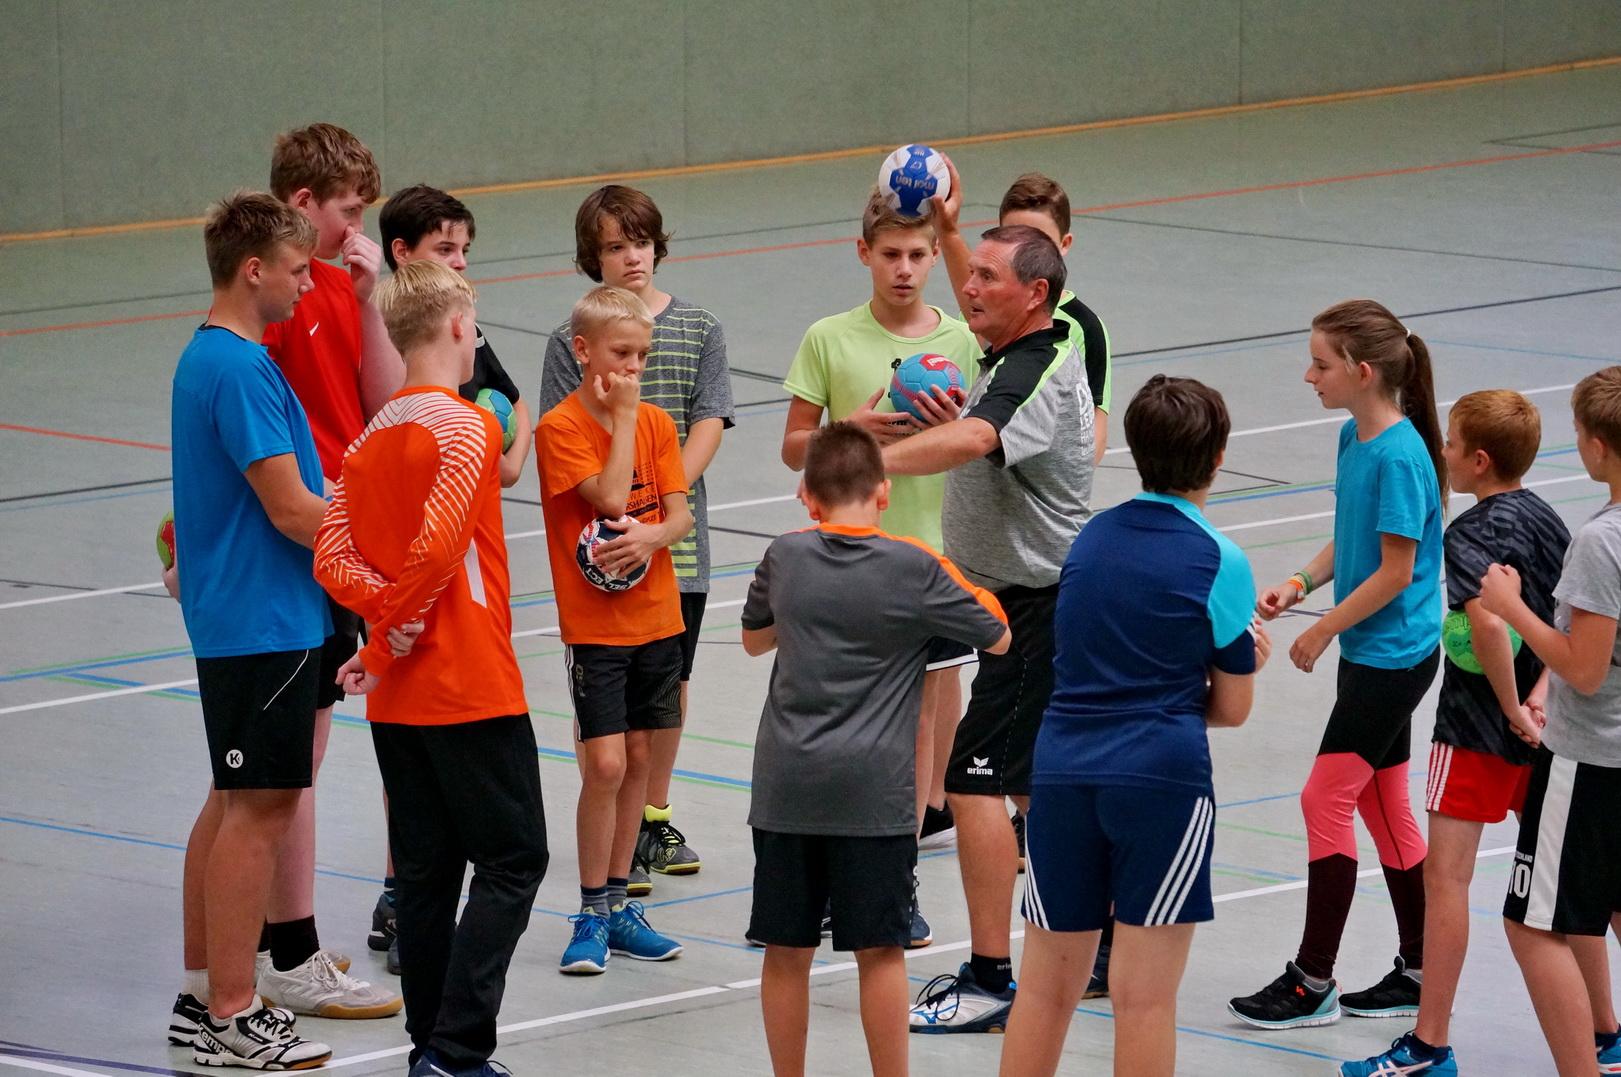 201808_Handballcamp_SDH_MG_098w